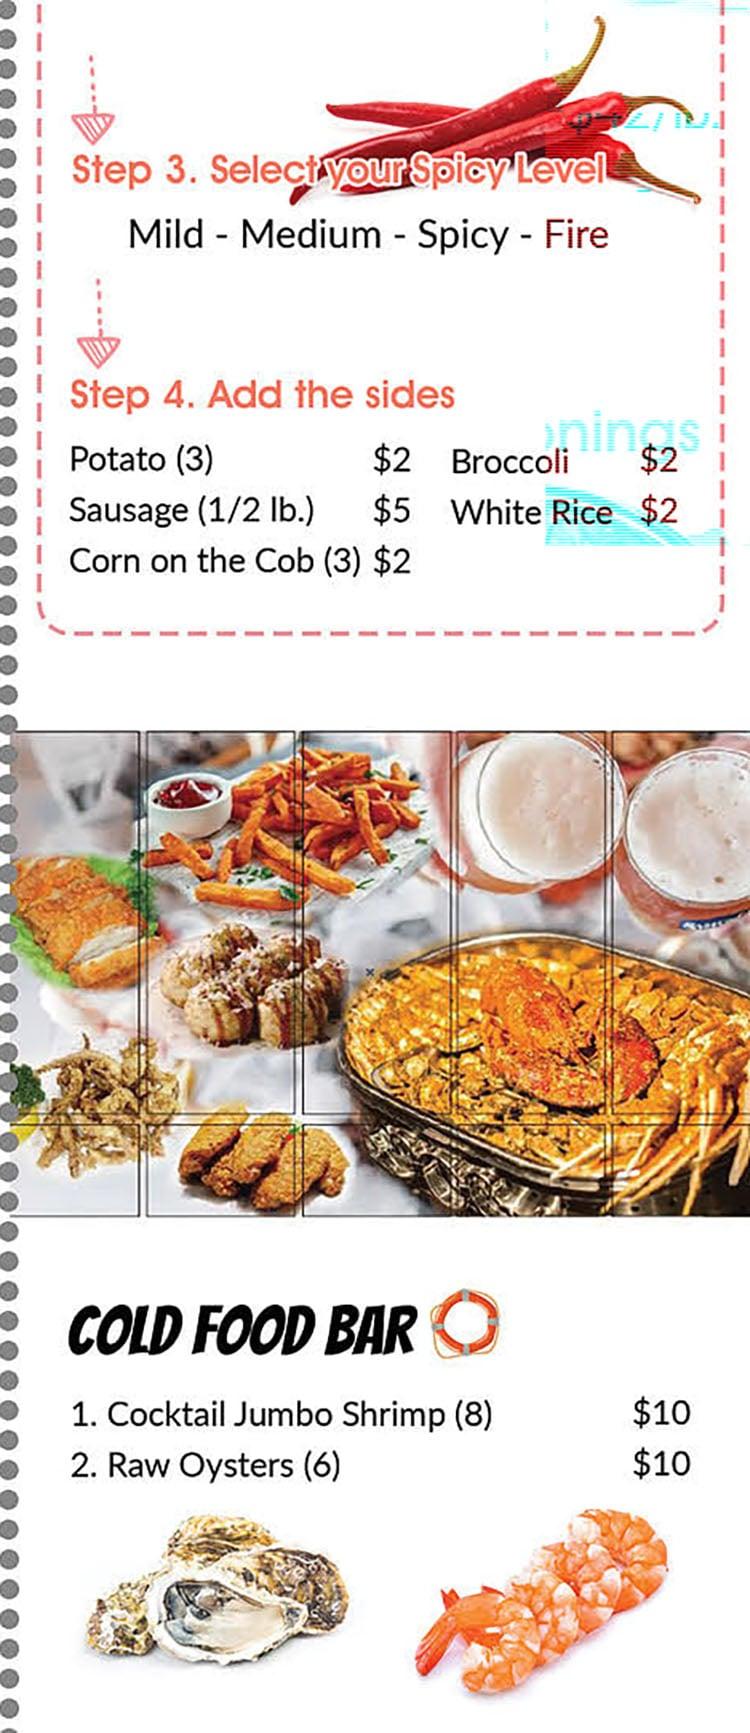 Cajun Boil Seafood Restaurant menu - seafood boils continued